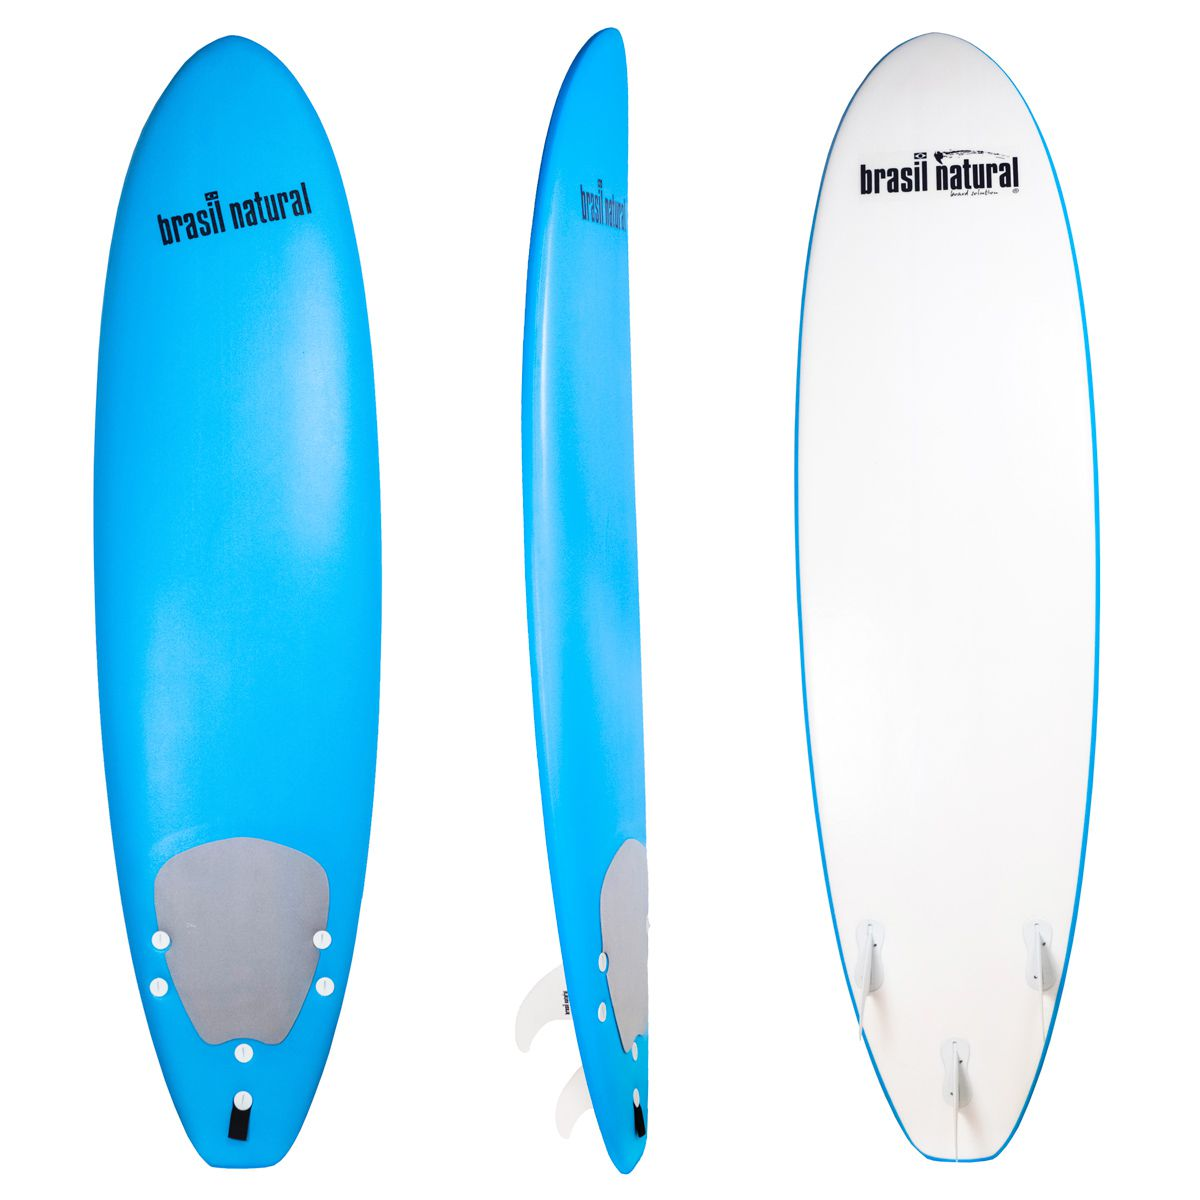 Prancha de surf infantil para crianças de até 55 KG - NEW EDITION - Brasil Natural